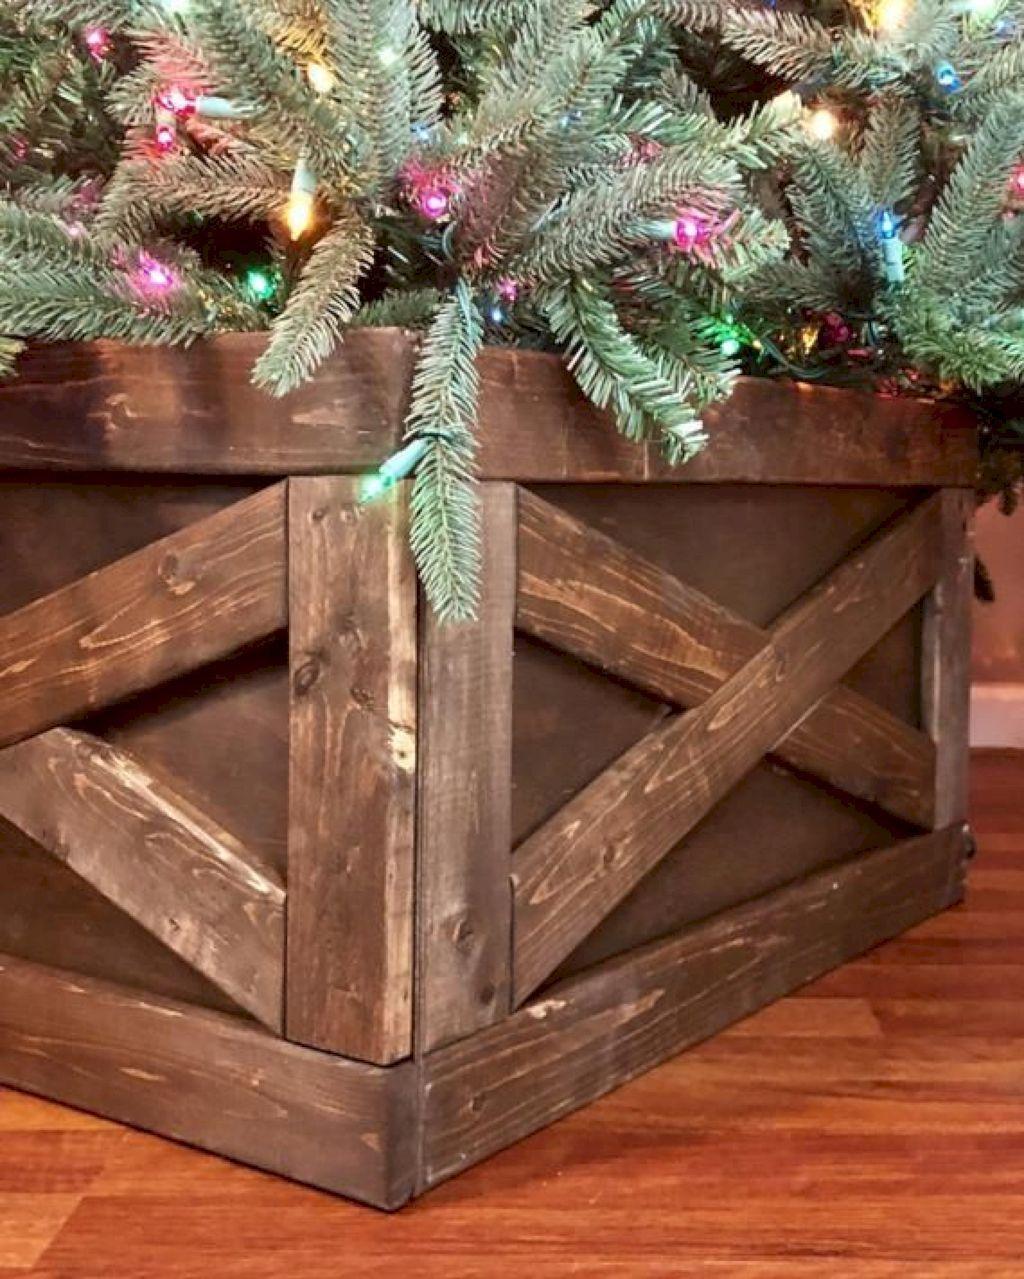 Live Christmas Decorations